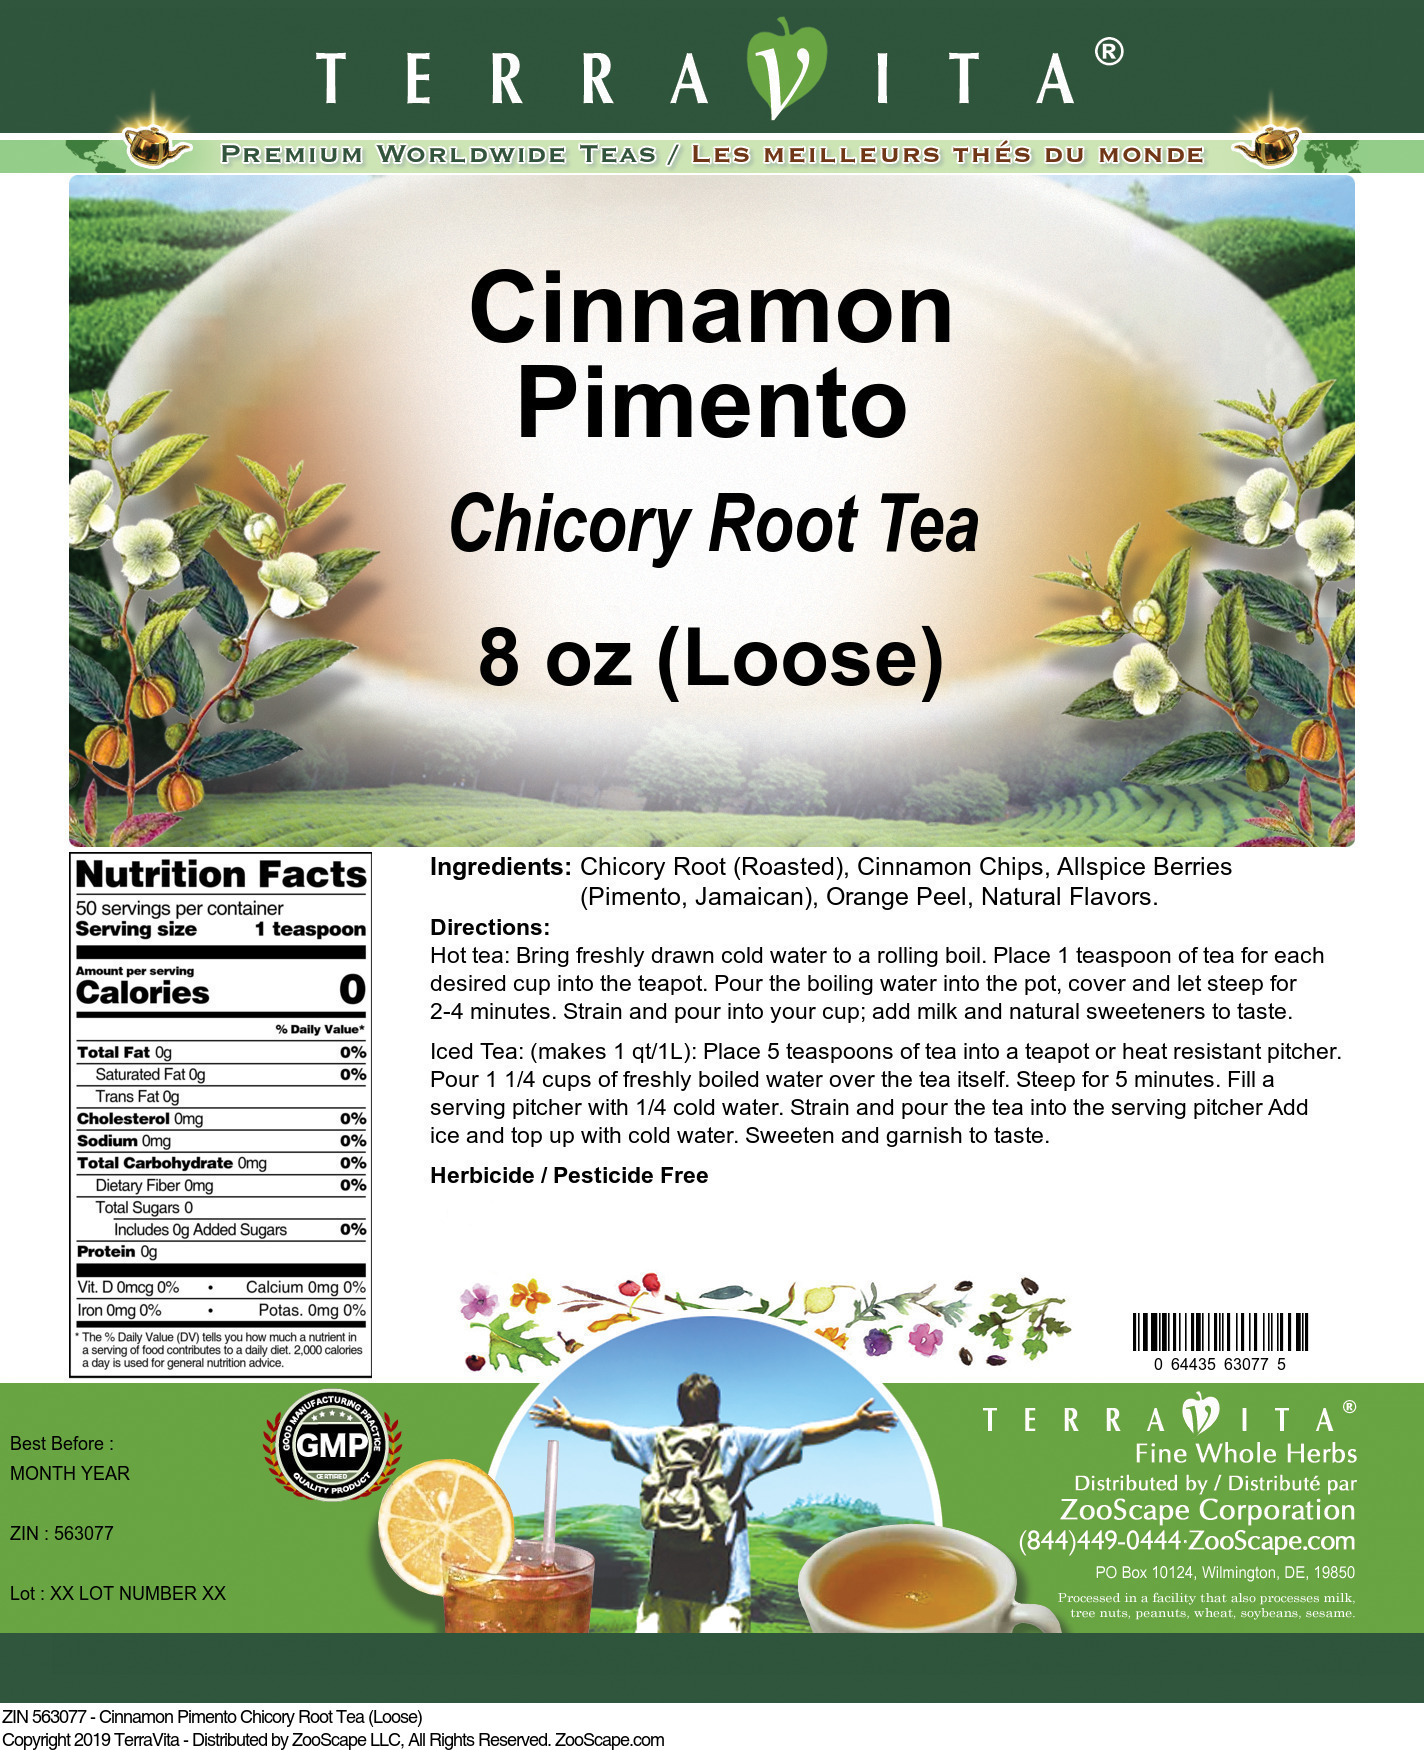 Cinnamon Pimento Chicory Root